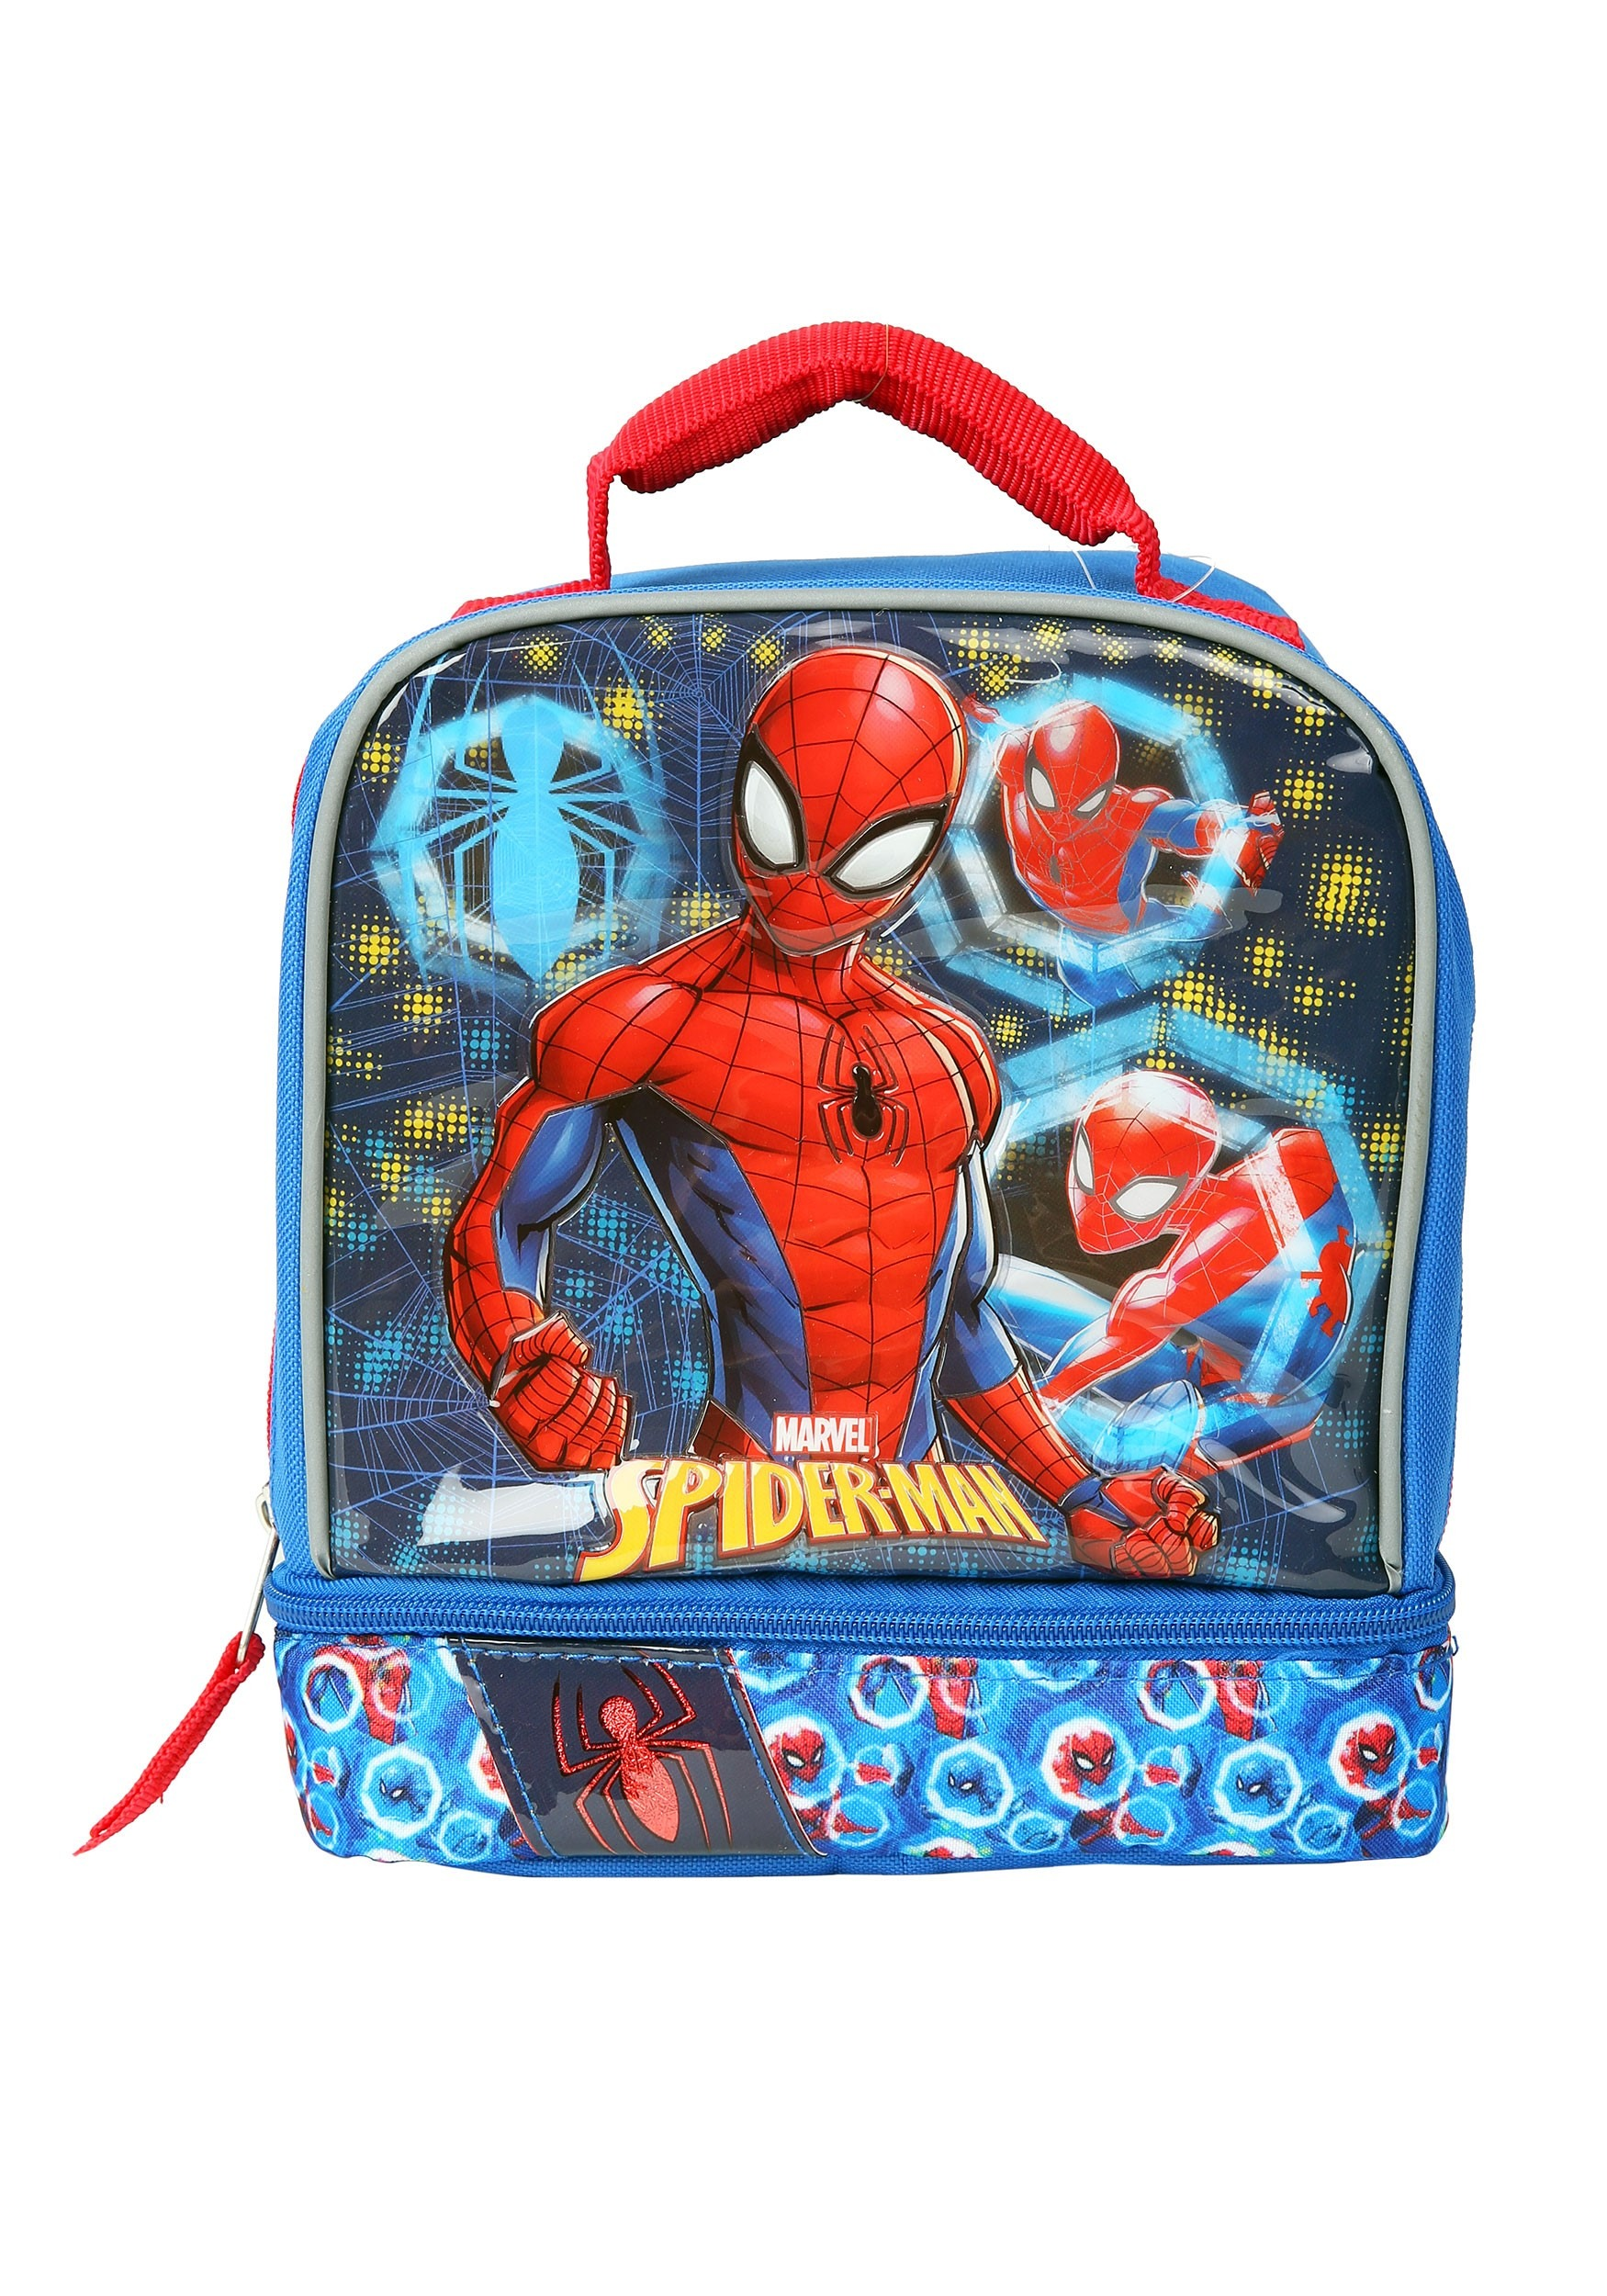 Marvel Spiderman Drop Bottom Lunch Kit